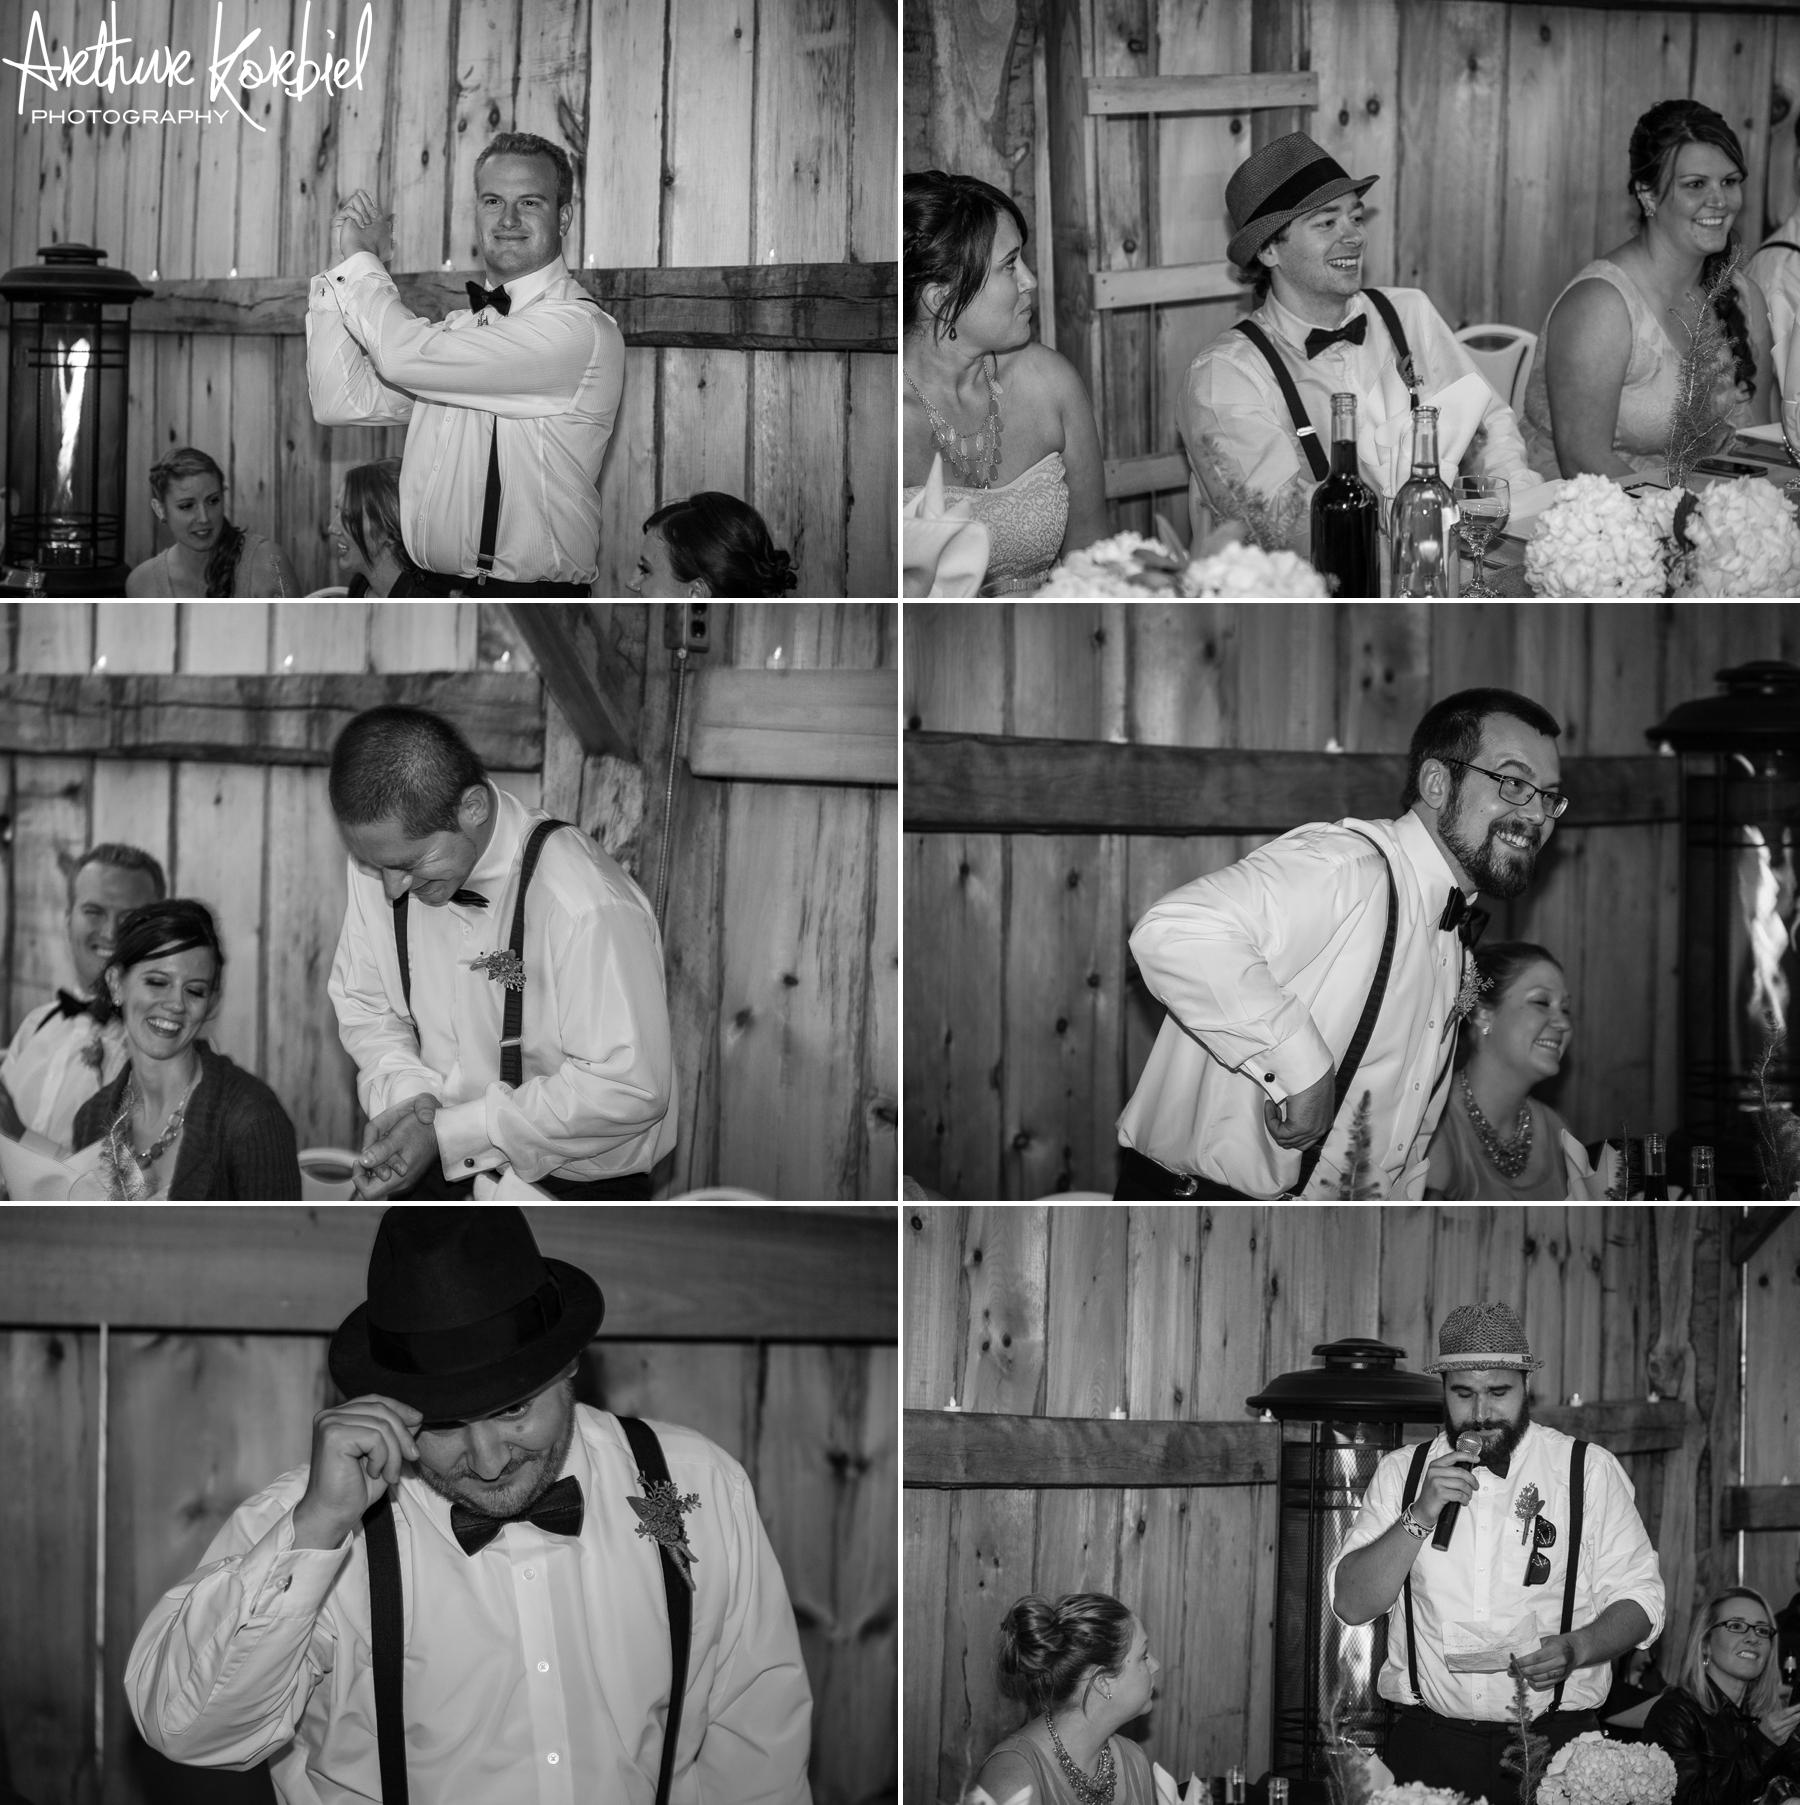 Arthur Korbiel Photography - London Engagement Photographer - Sauble Beach Barn Wedding - Samantha & Dan_012.jpg